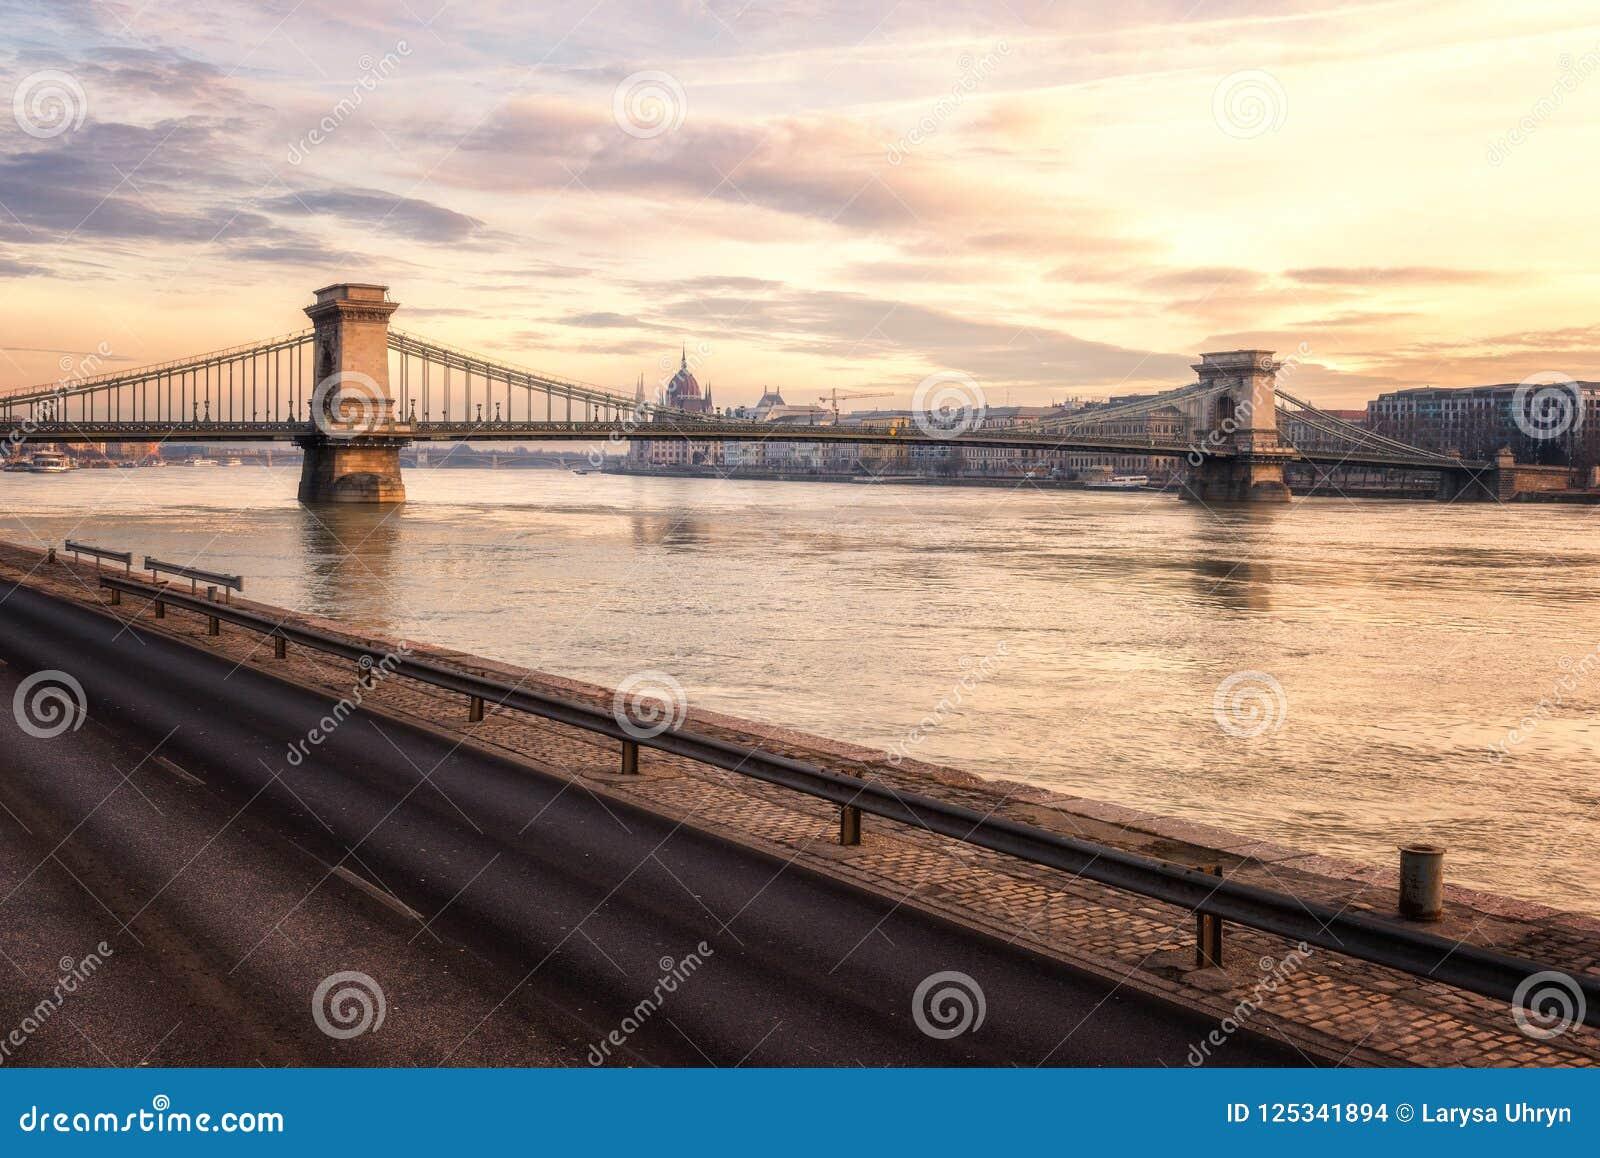 Budapest horisont, härlig cityscape av det historiska området, Ungern, Europa